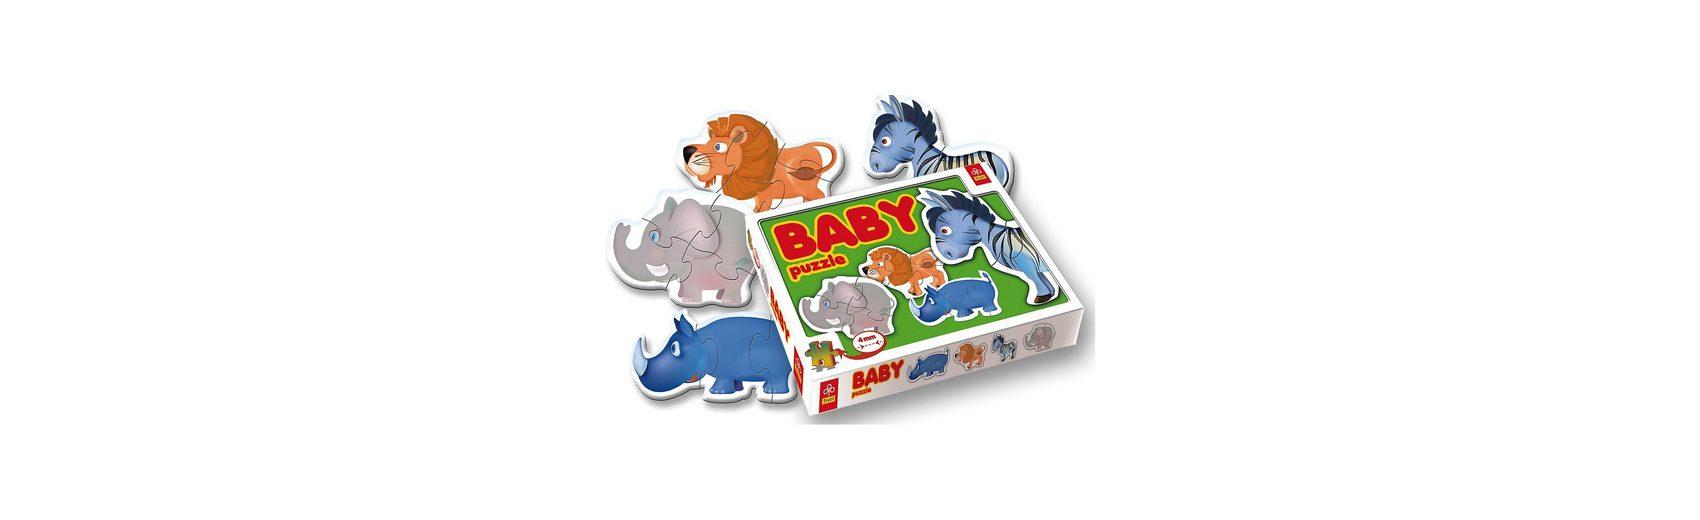 Trefl Baby Puzzle-Set - 4 Puzzles mit 2-4 Teilen - Tiere Zoo